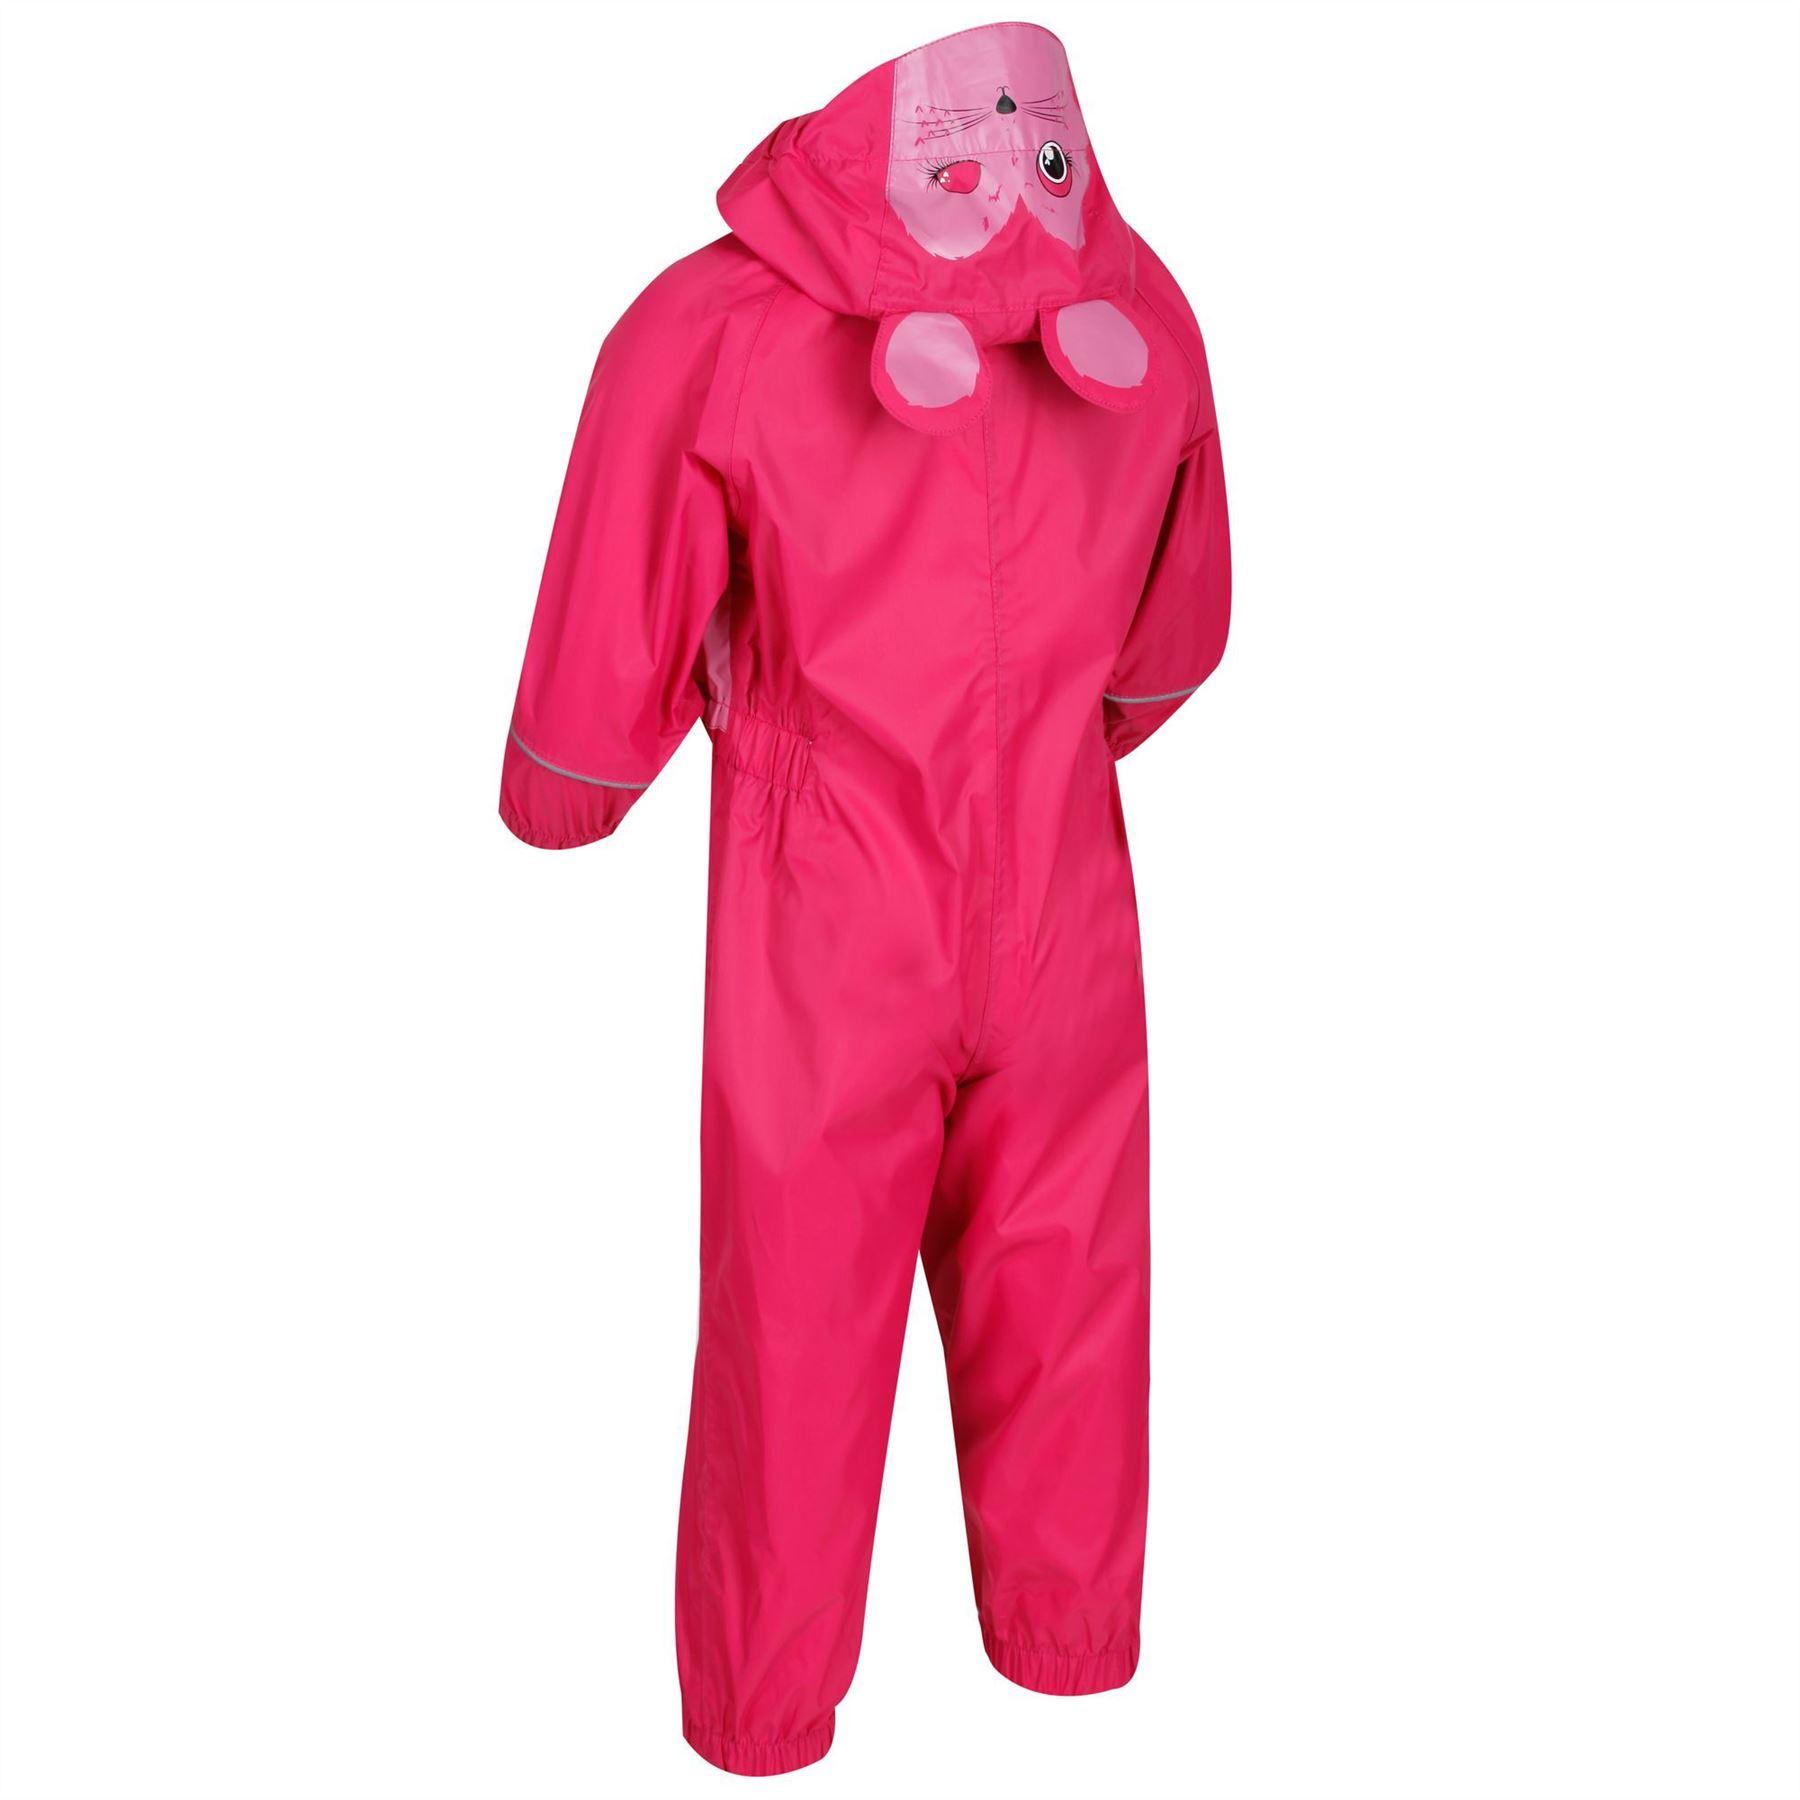 miniatuur 5 - Regatta Kids Charco All in Onezee Waterproof Puddle Suit Animal style Boys Girls